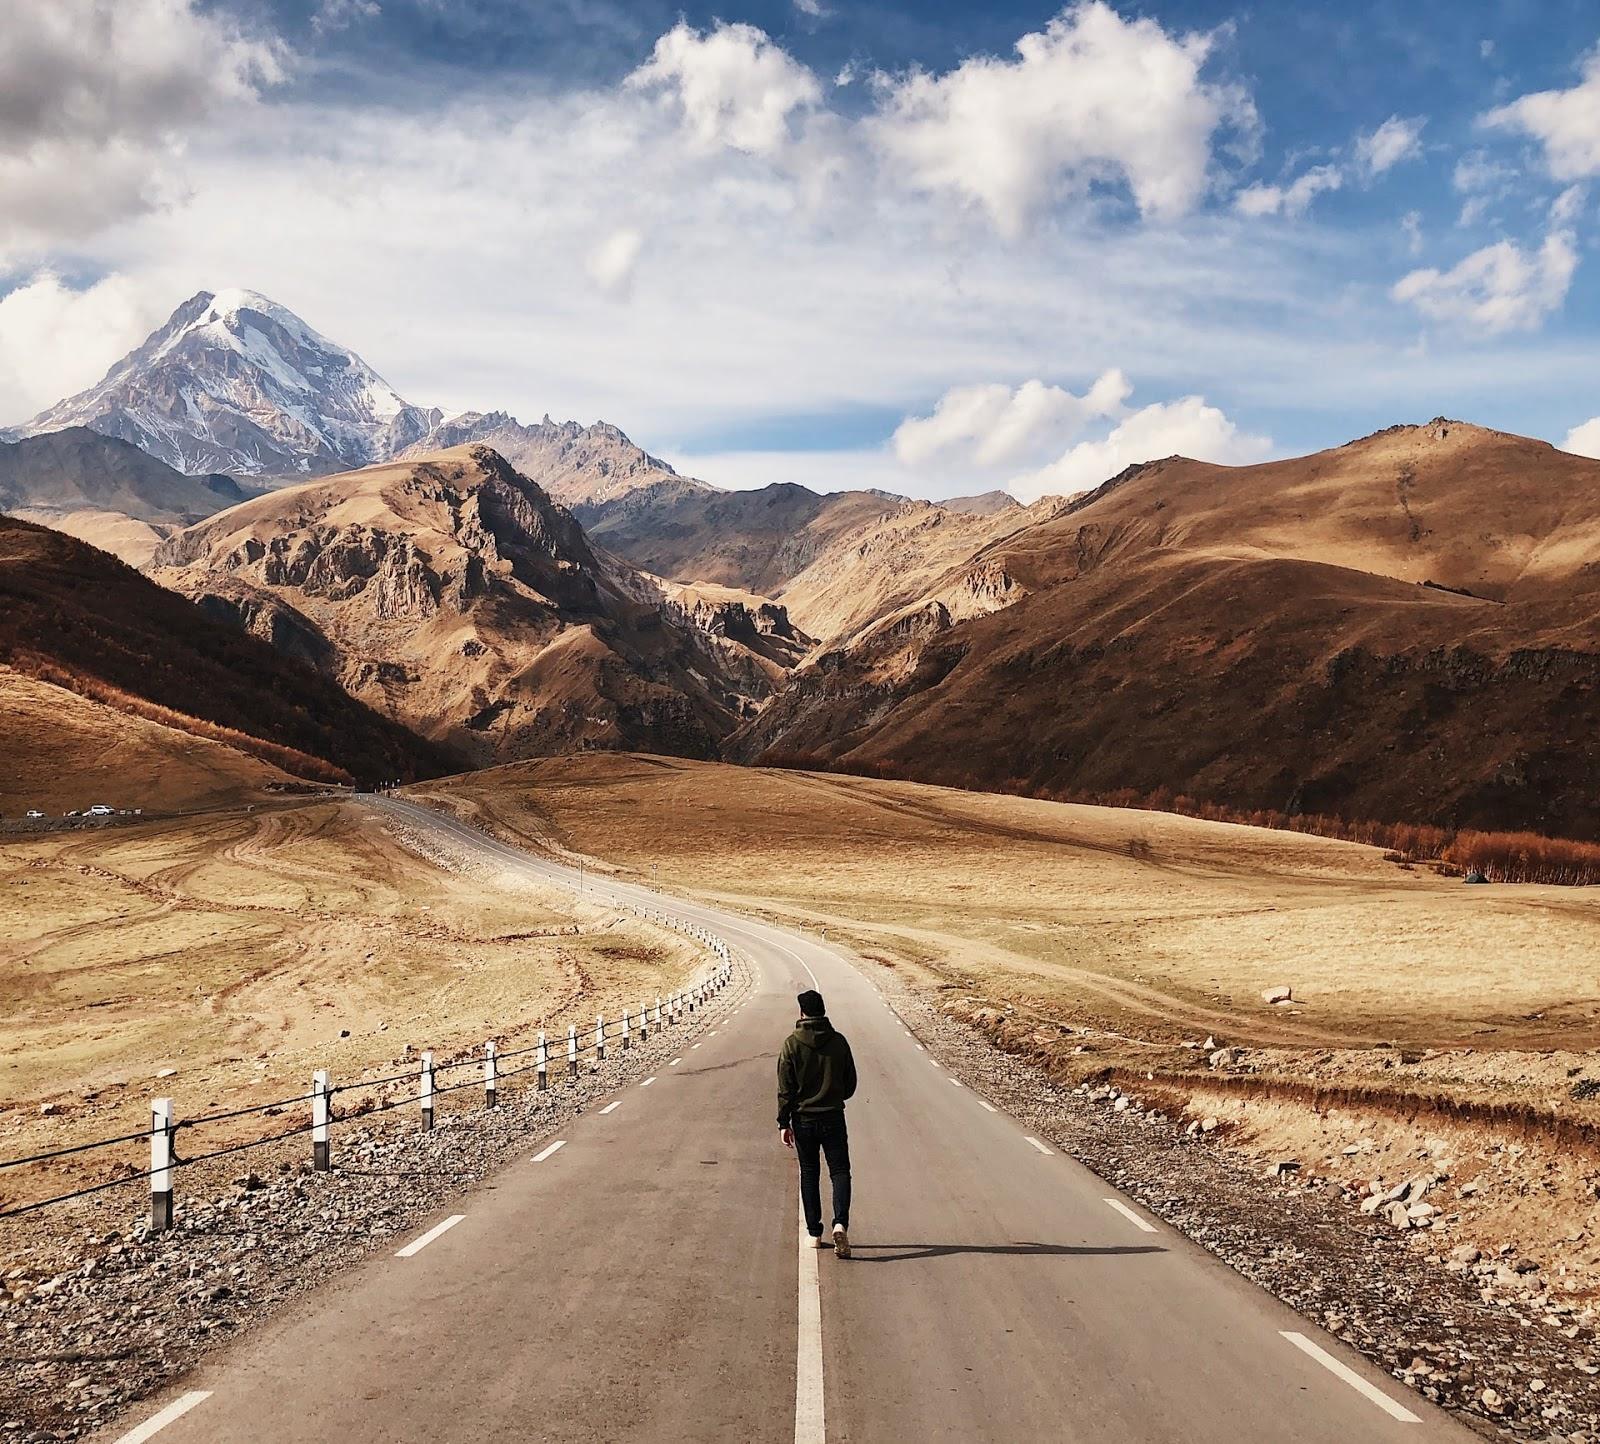 man walking on a road